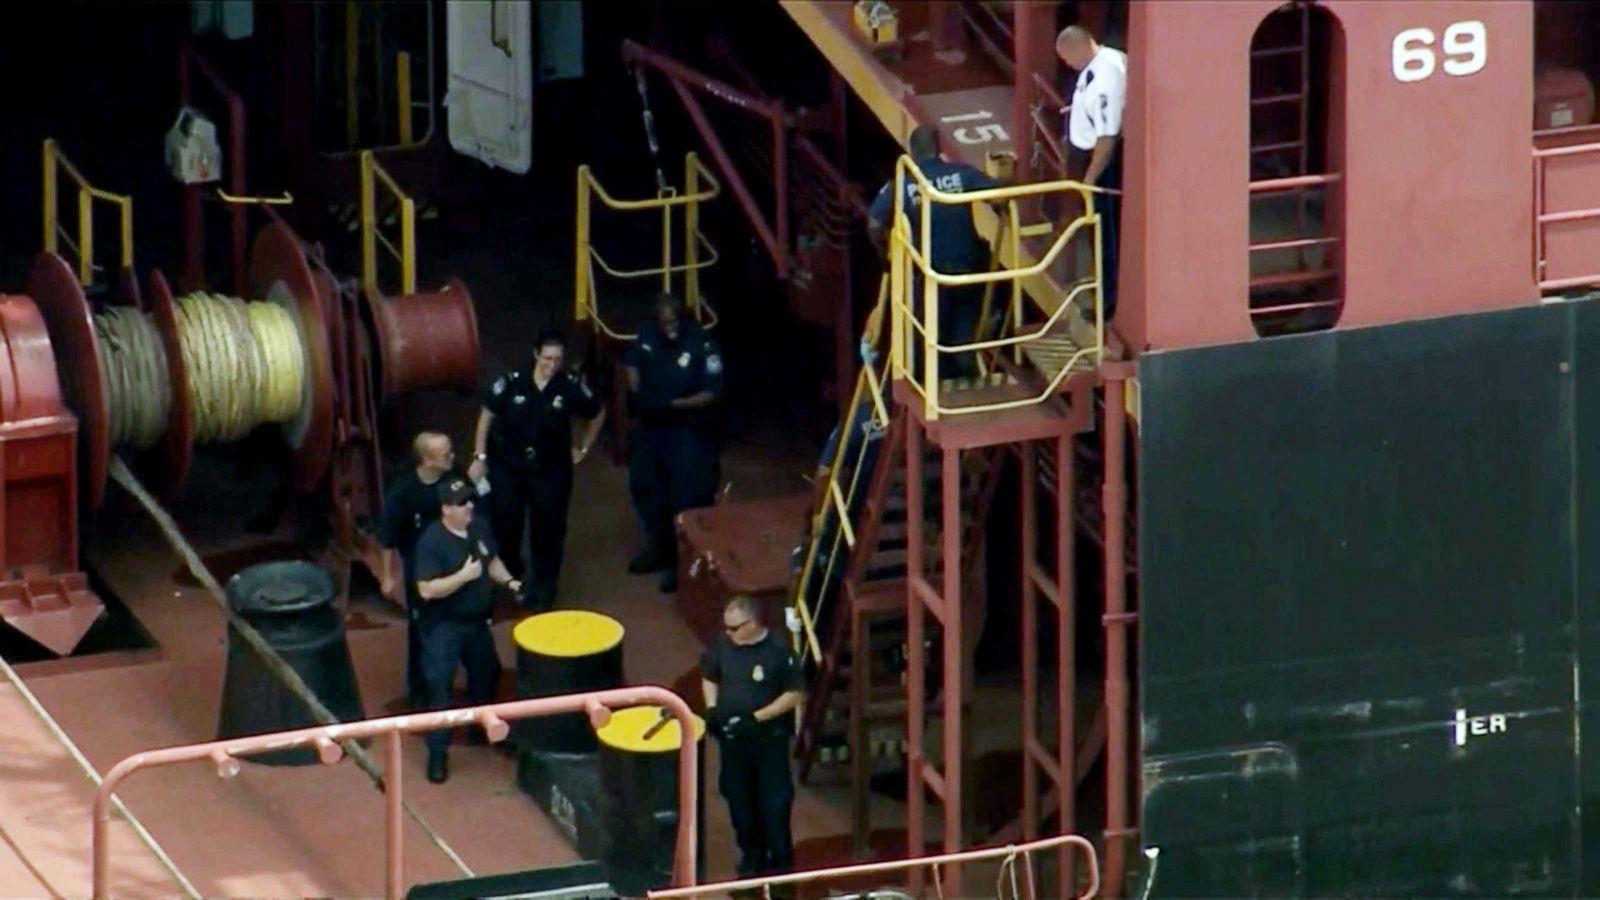 Image result for Feds seize over $1 billion of cocaine in historic bust in Philadelphia